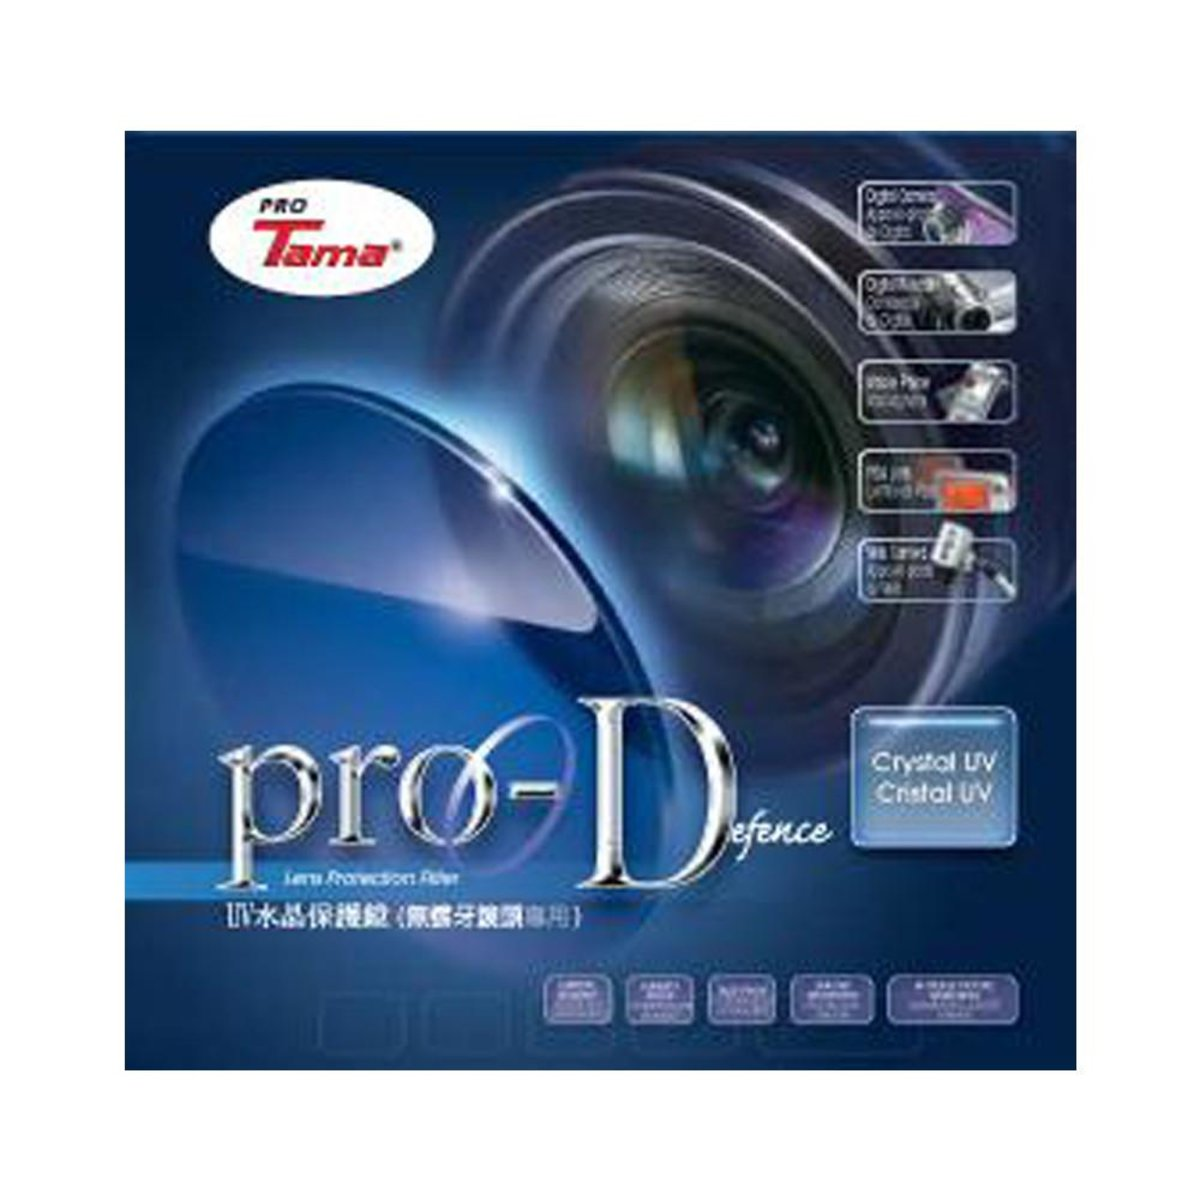 Protama Pro-Defence Crystal UV Filter 40MM